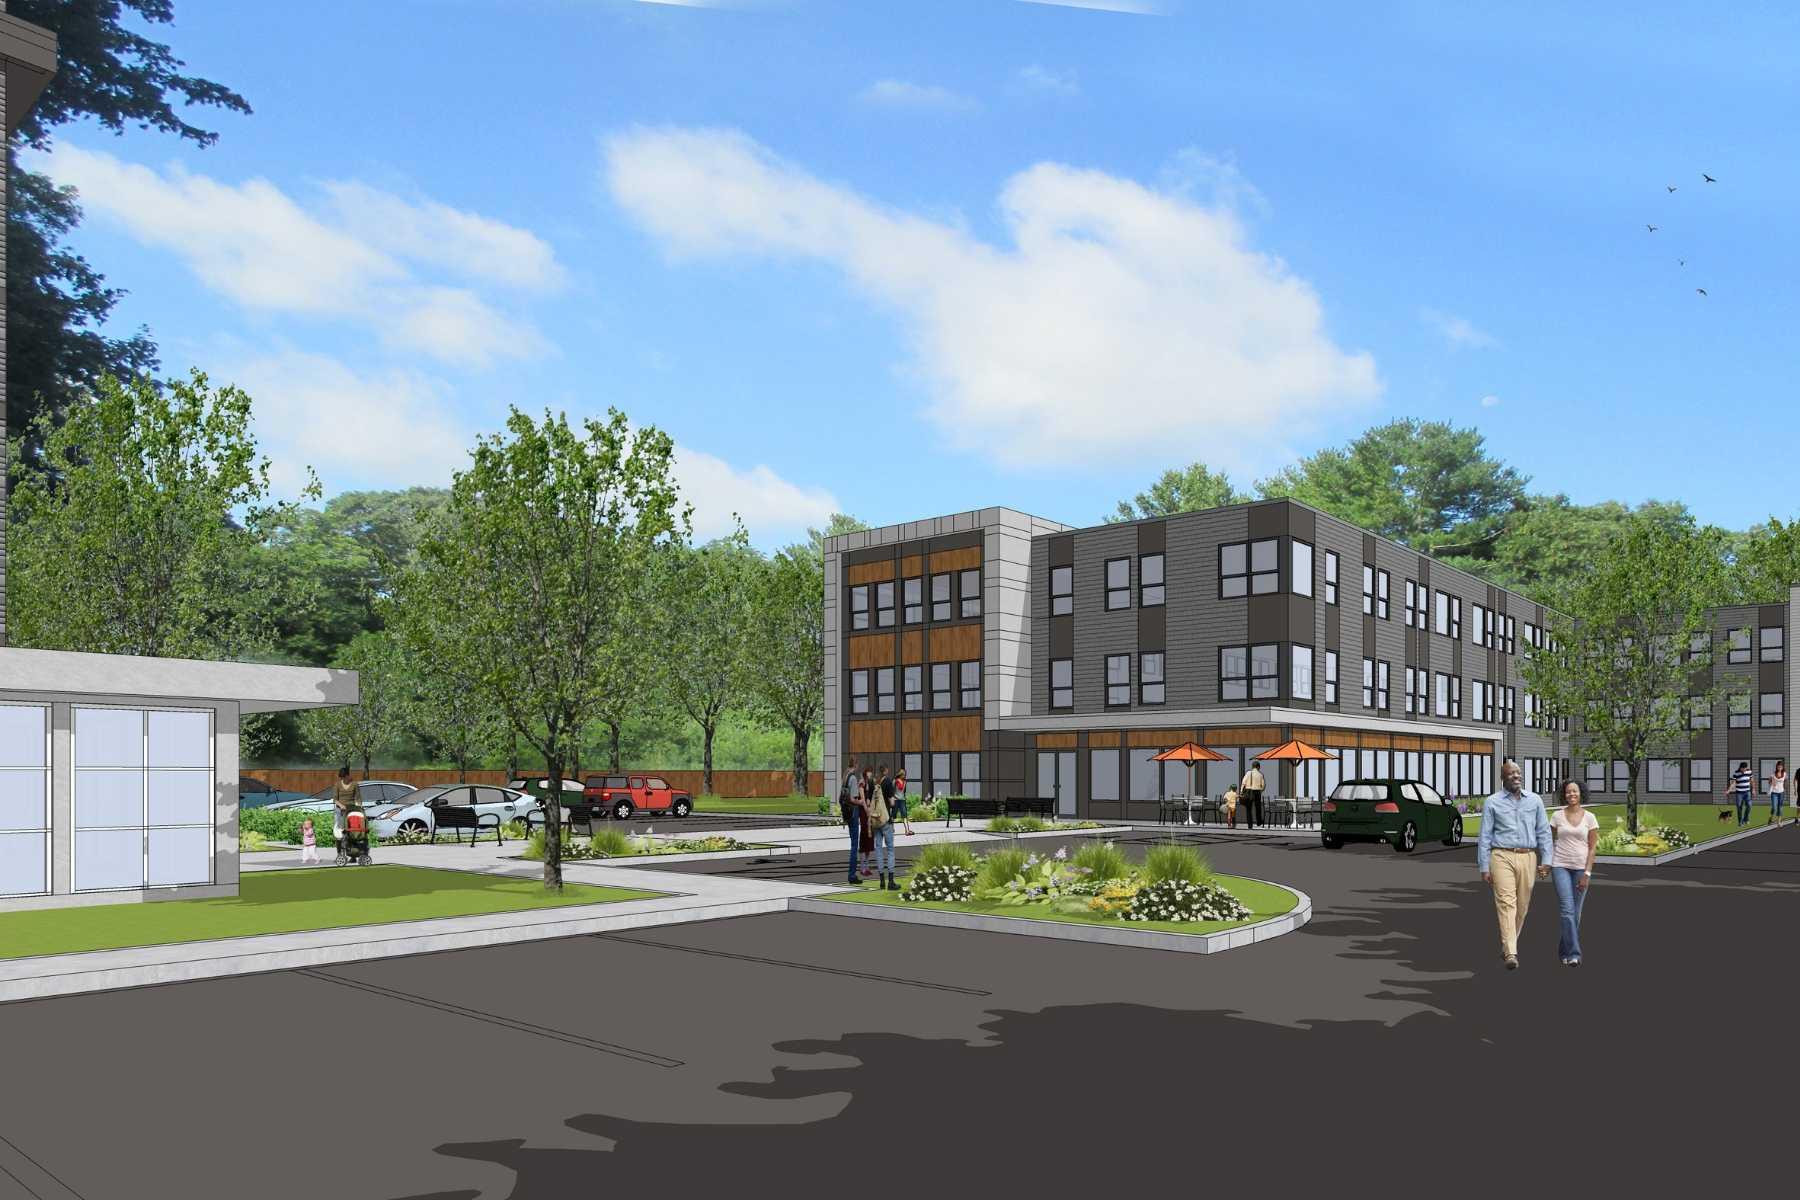 5-CapstoneCommunities-property-McElwainSchoolApartments-Bridgewater.jpg